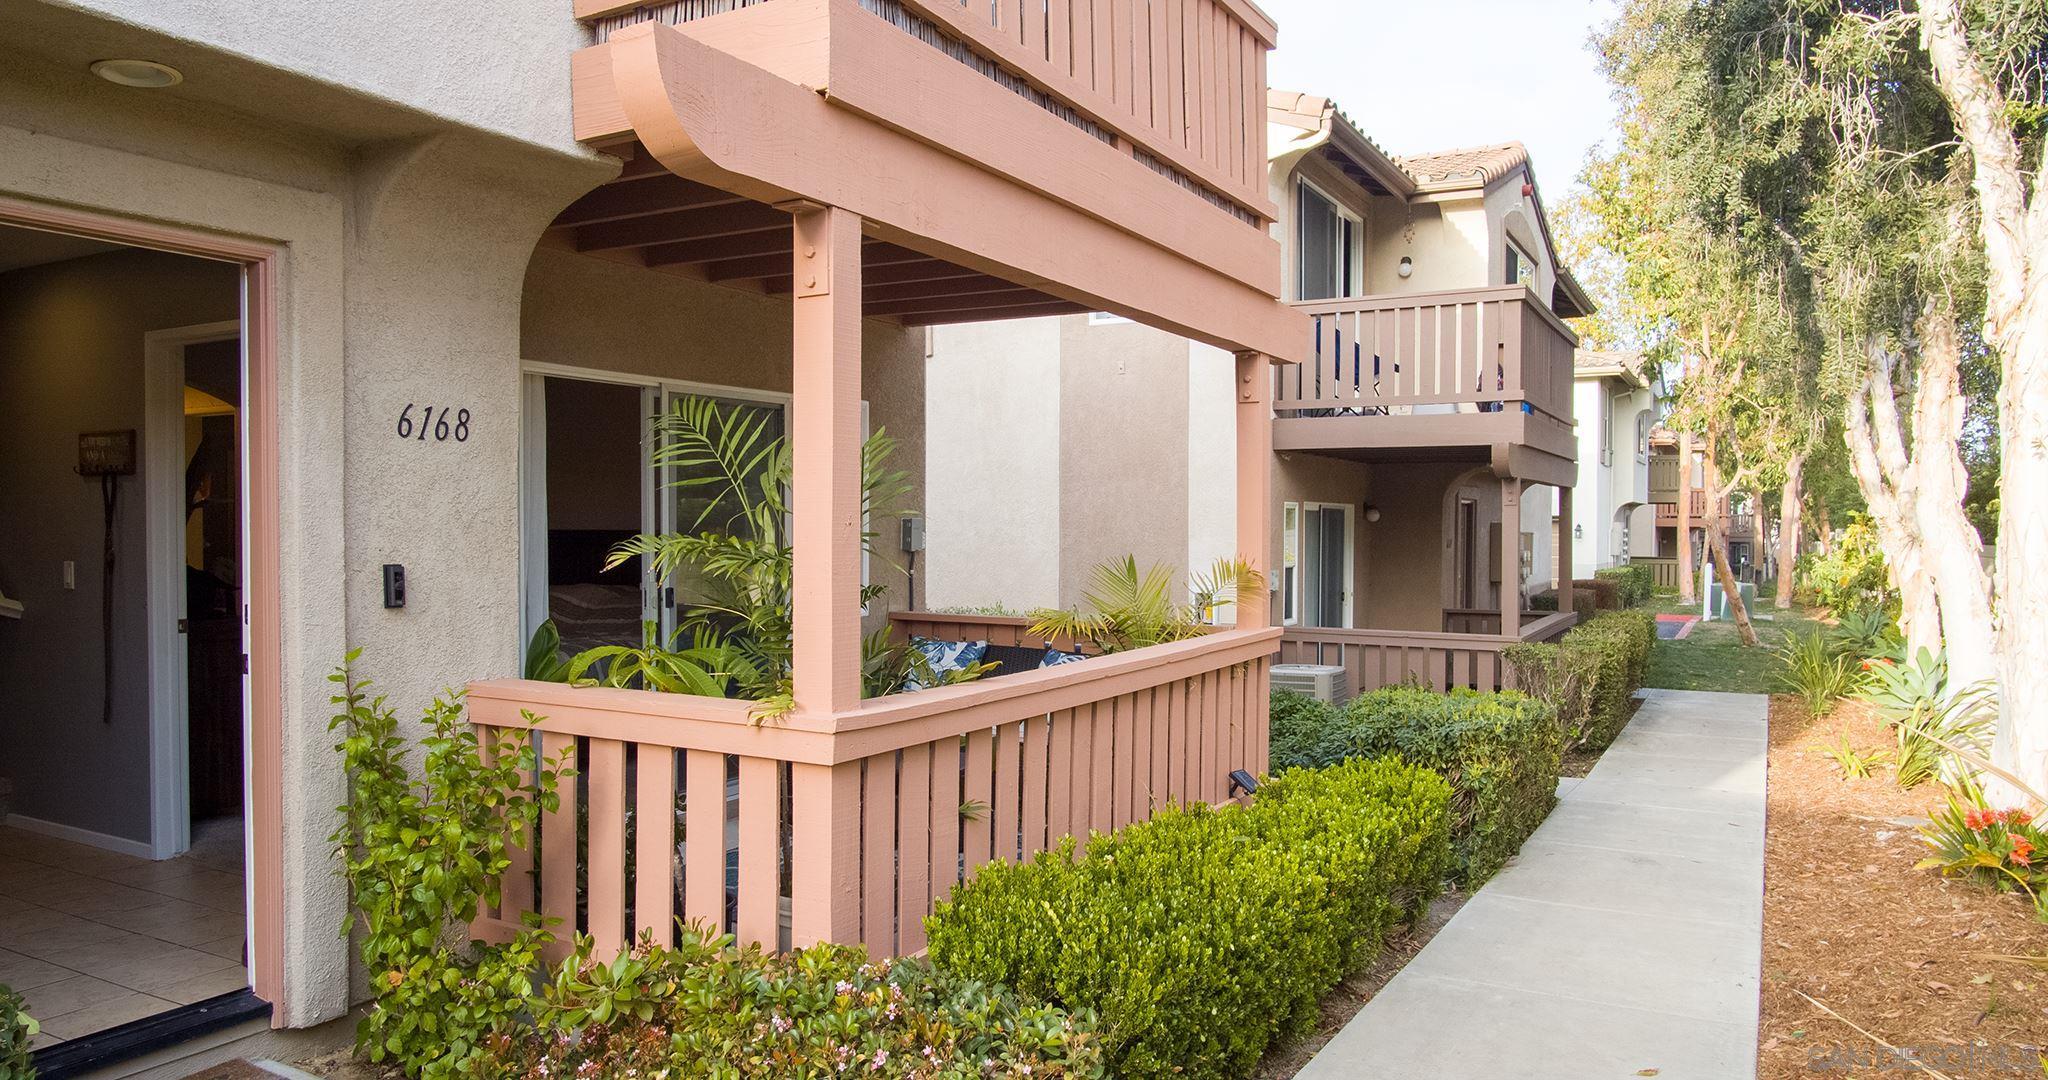 Carlsbad, CA 92009